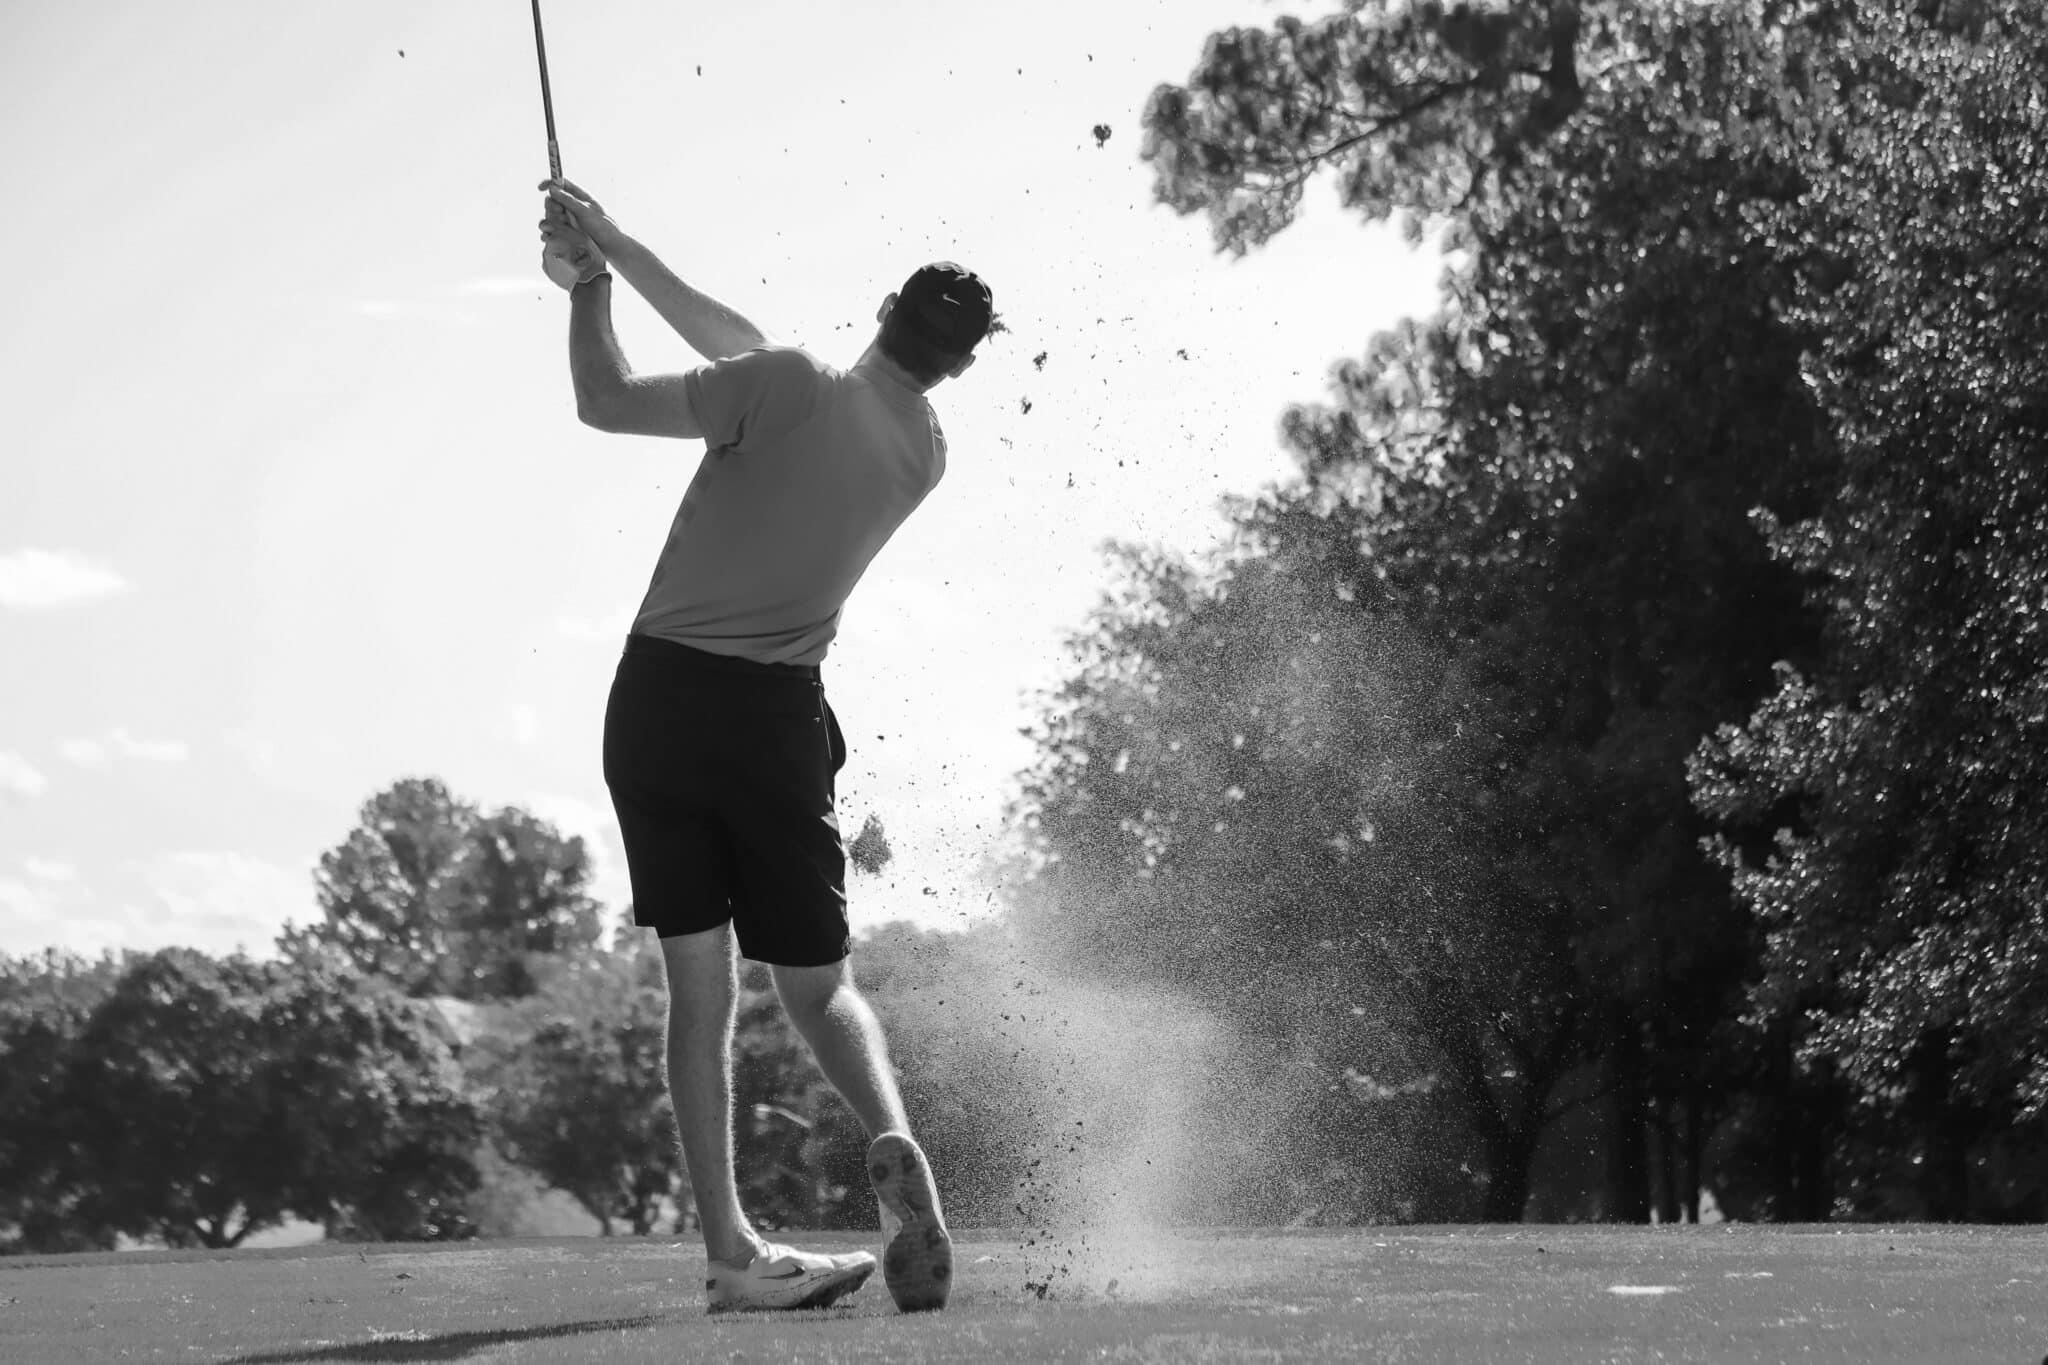 Person hitting golf ball